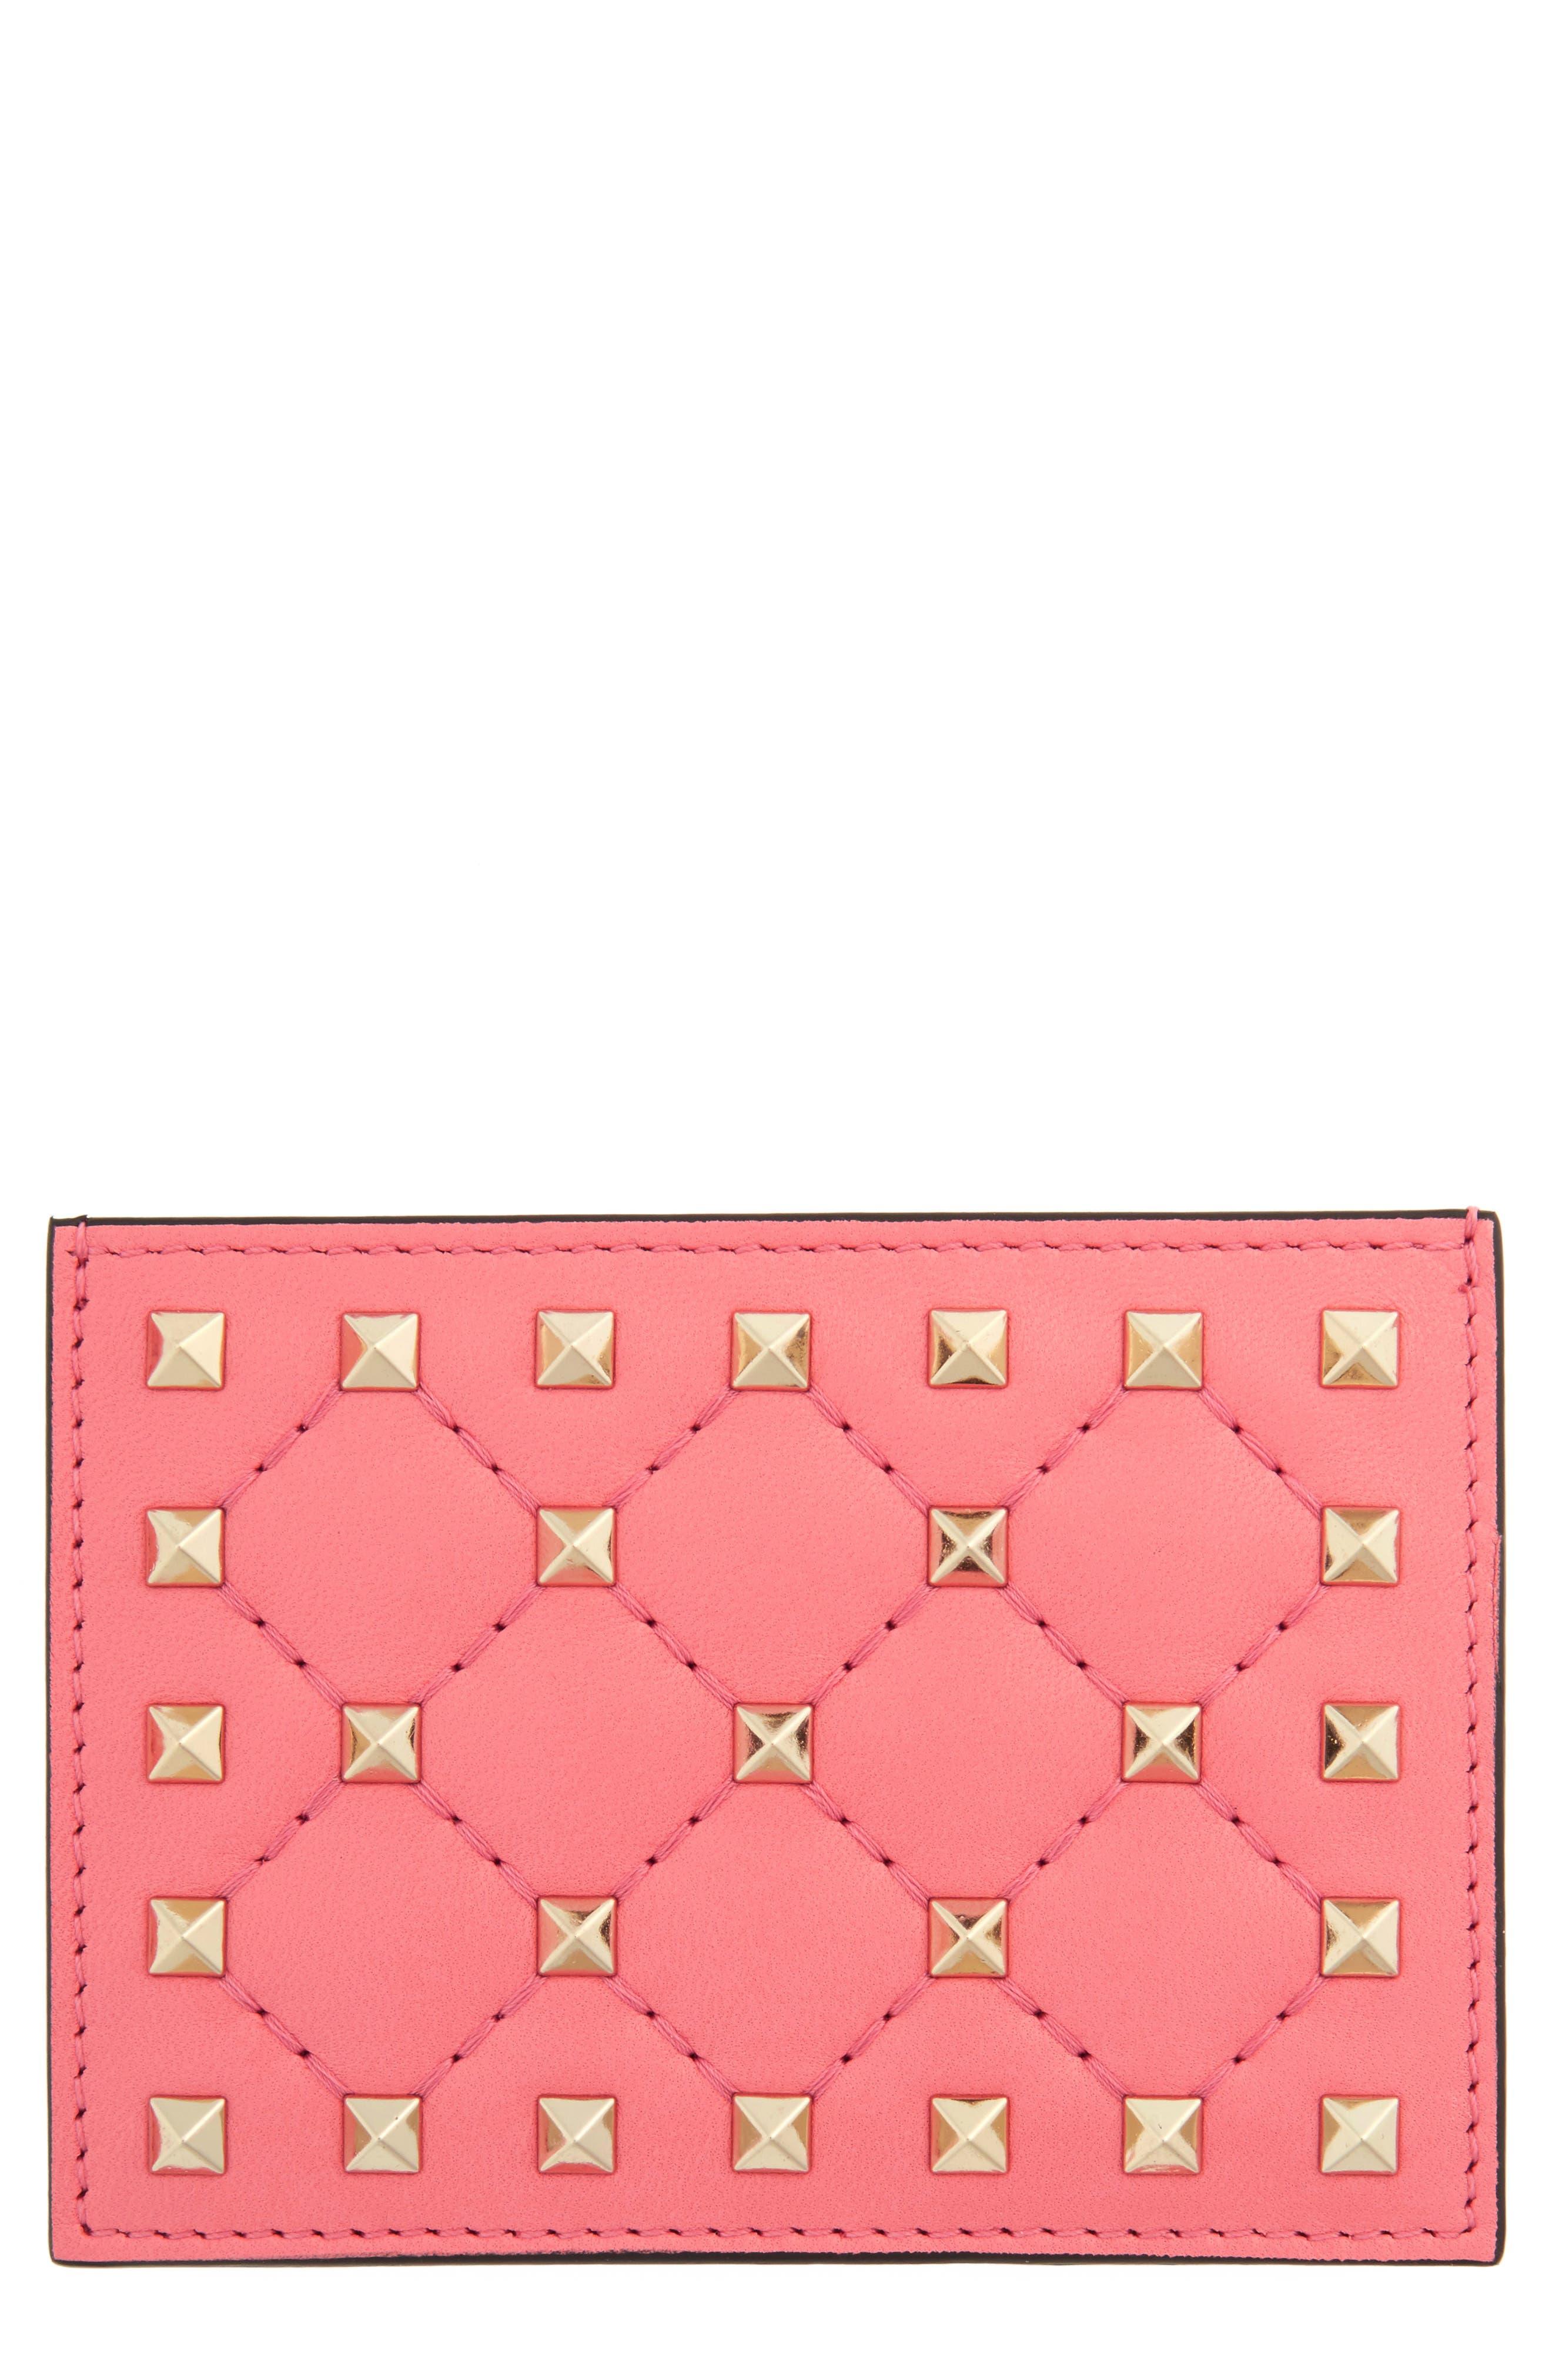 Main Image - VALENTINO GARAVANI Rockstud Nappa Leather Card Case